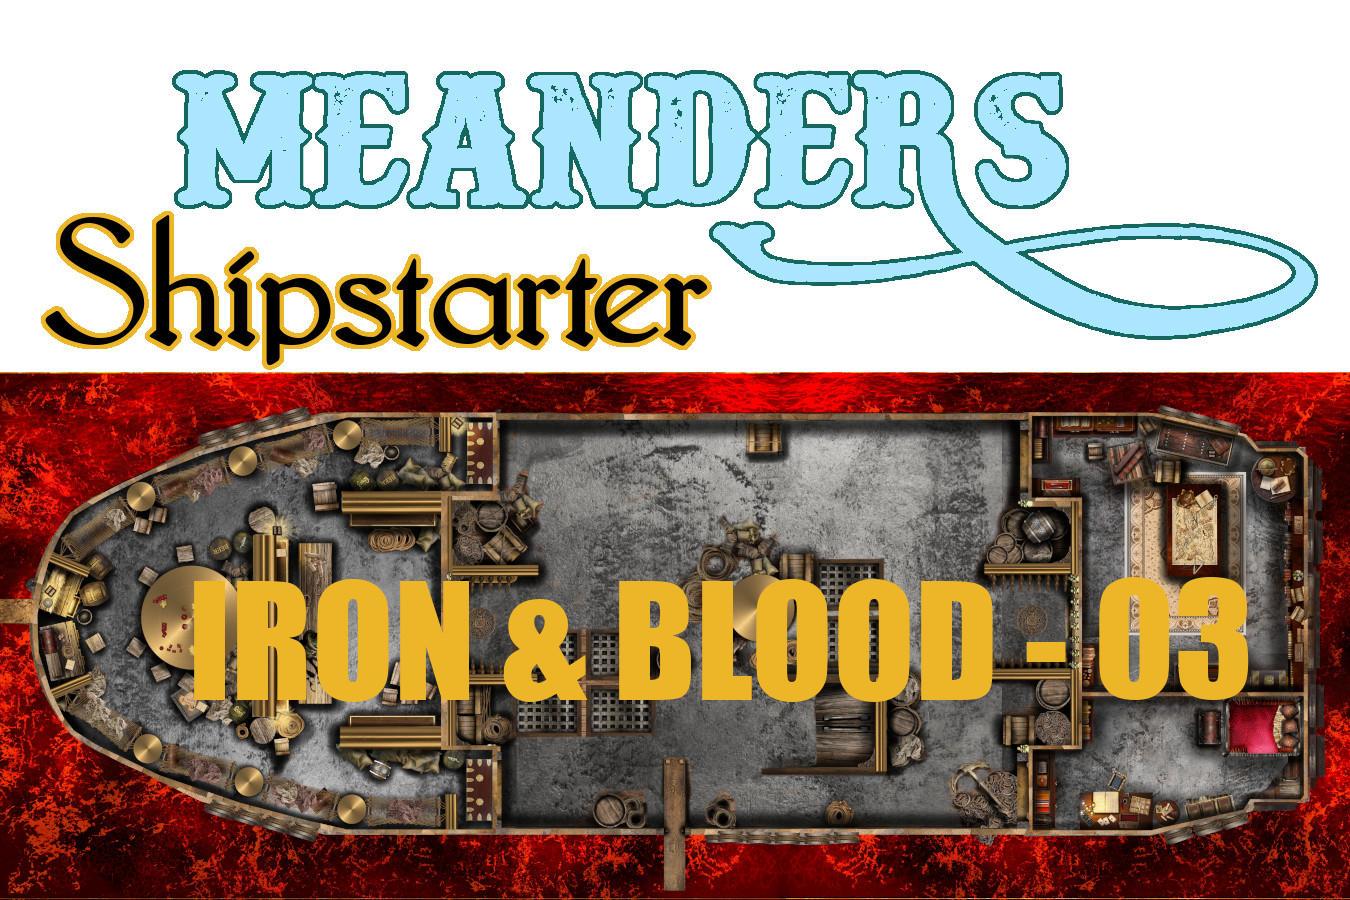 Shipstarter Iron and Blood 03 promo.jpg